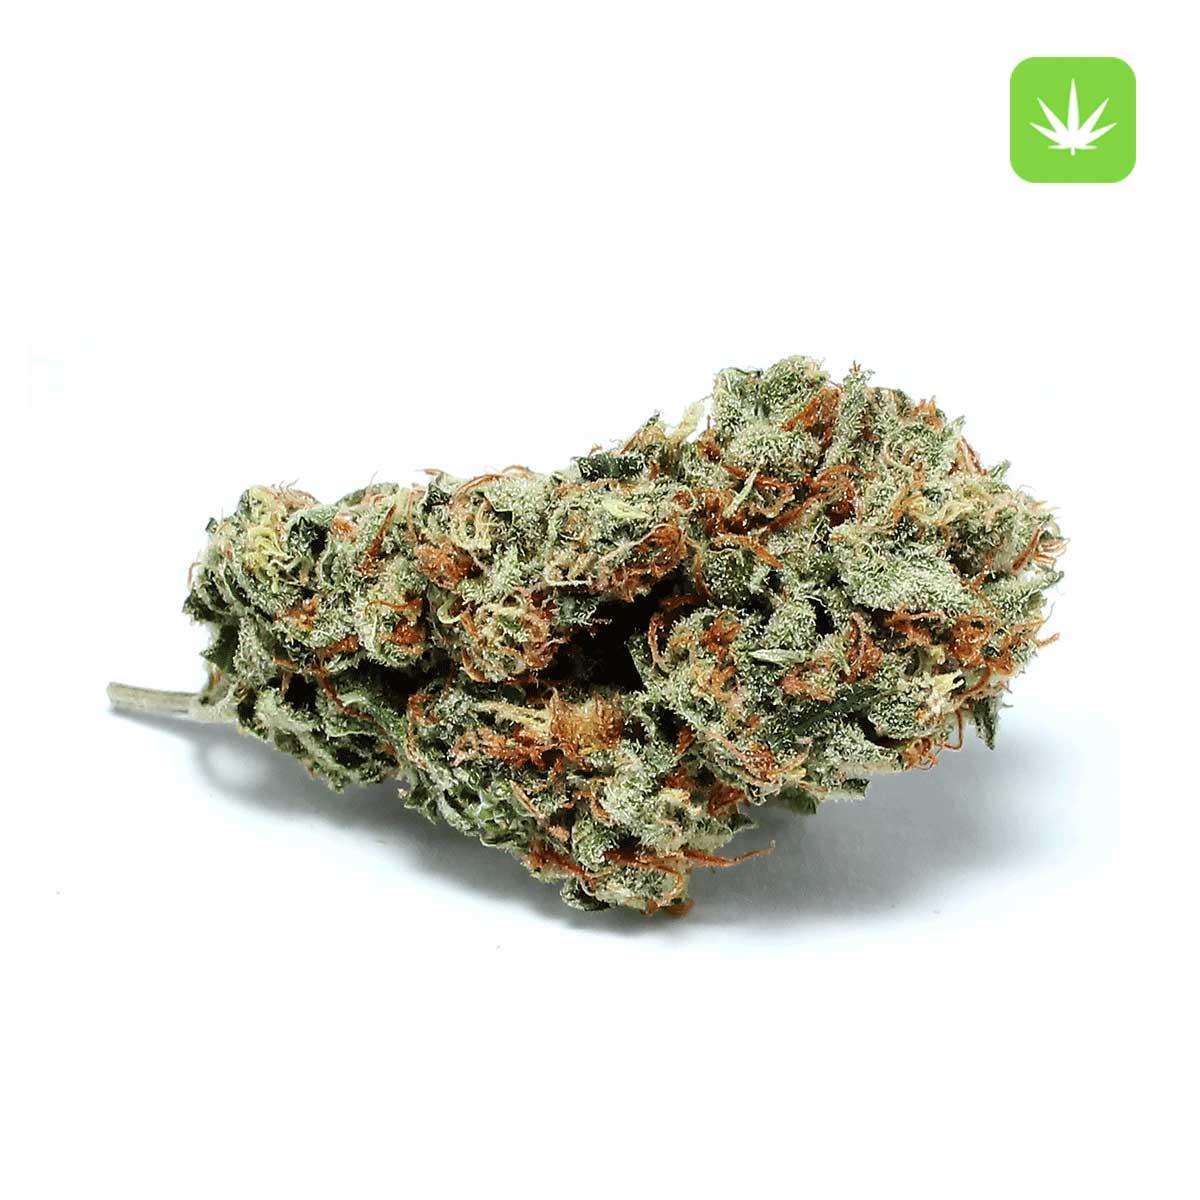 Super lemon Haze Small Nugs Cannabis Avenue 2